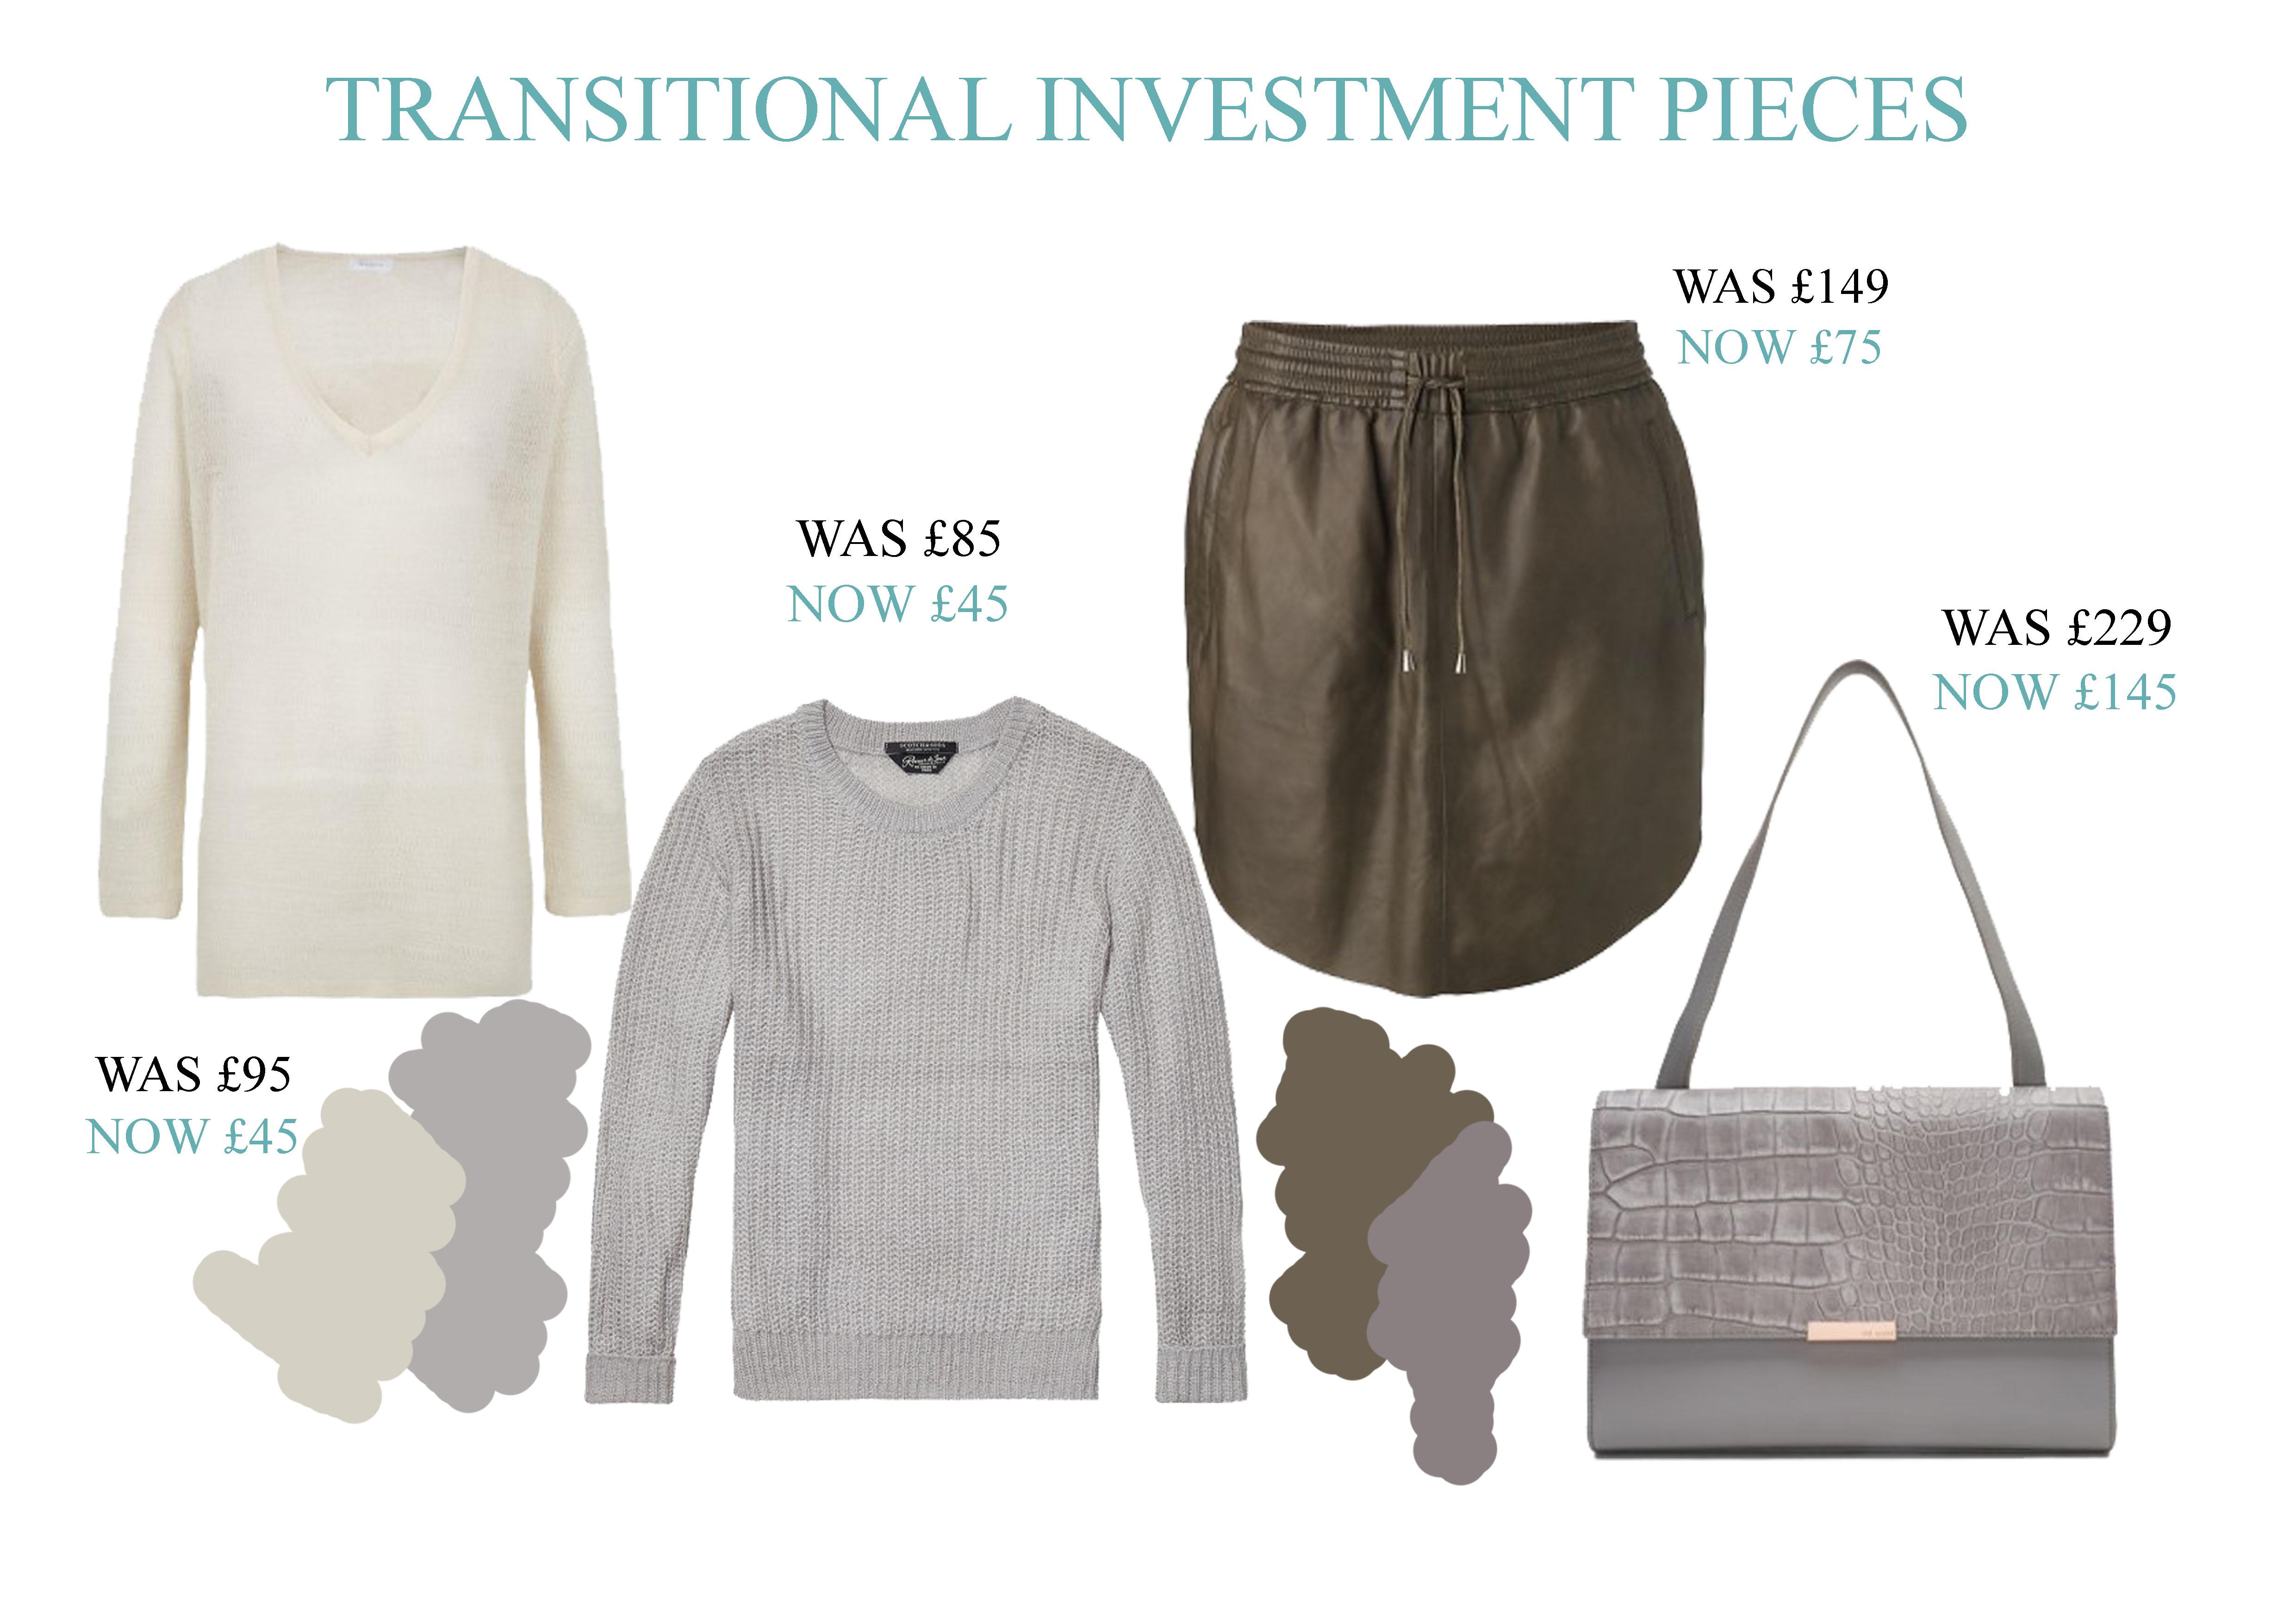 investment pieces